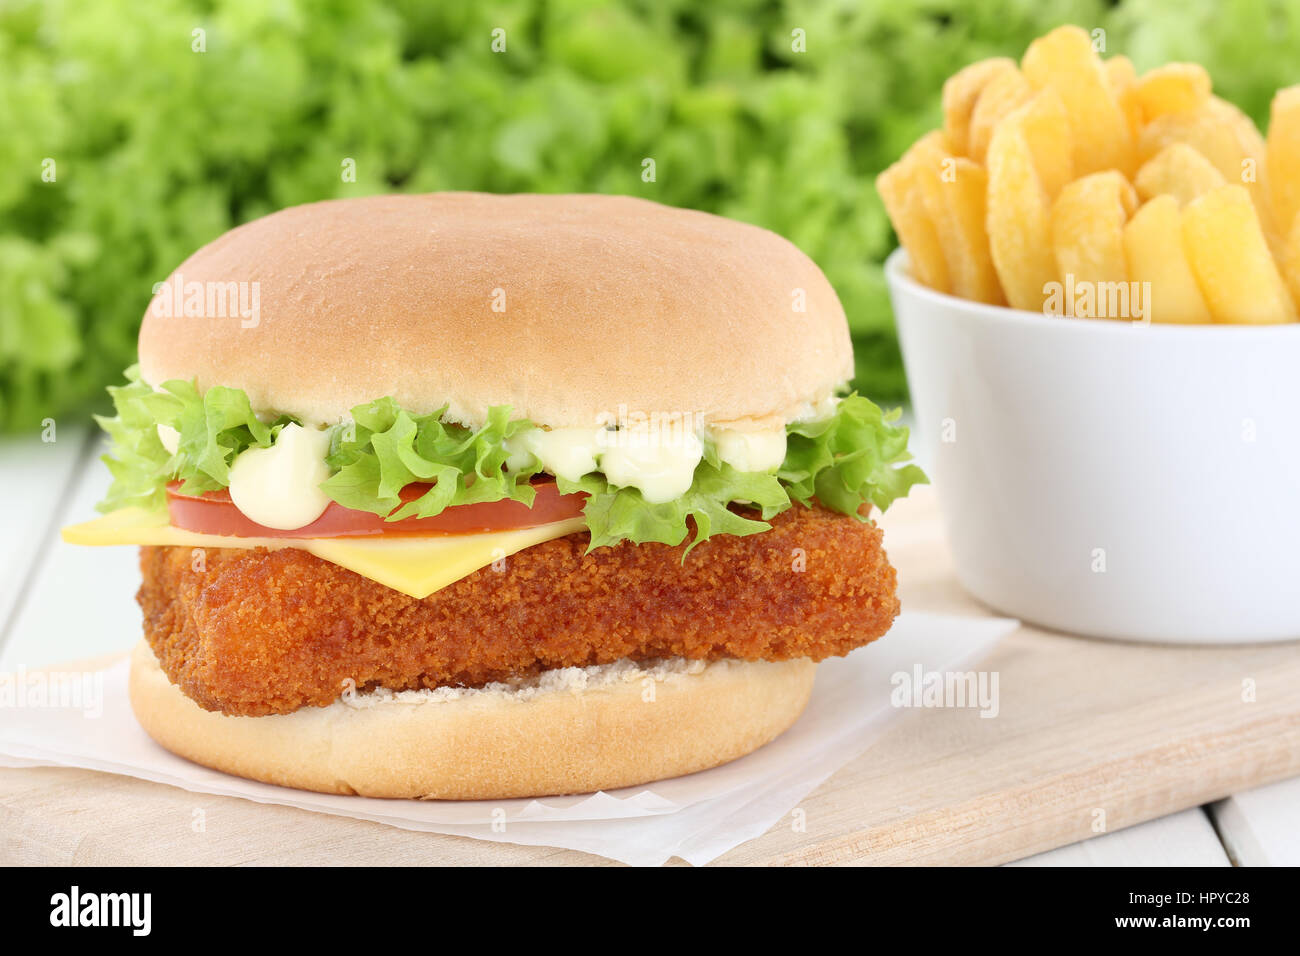 Fisch burger fishburger Hamburger mit Pommes frites Tomaten Salat Käse ungesund Stockbild